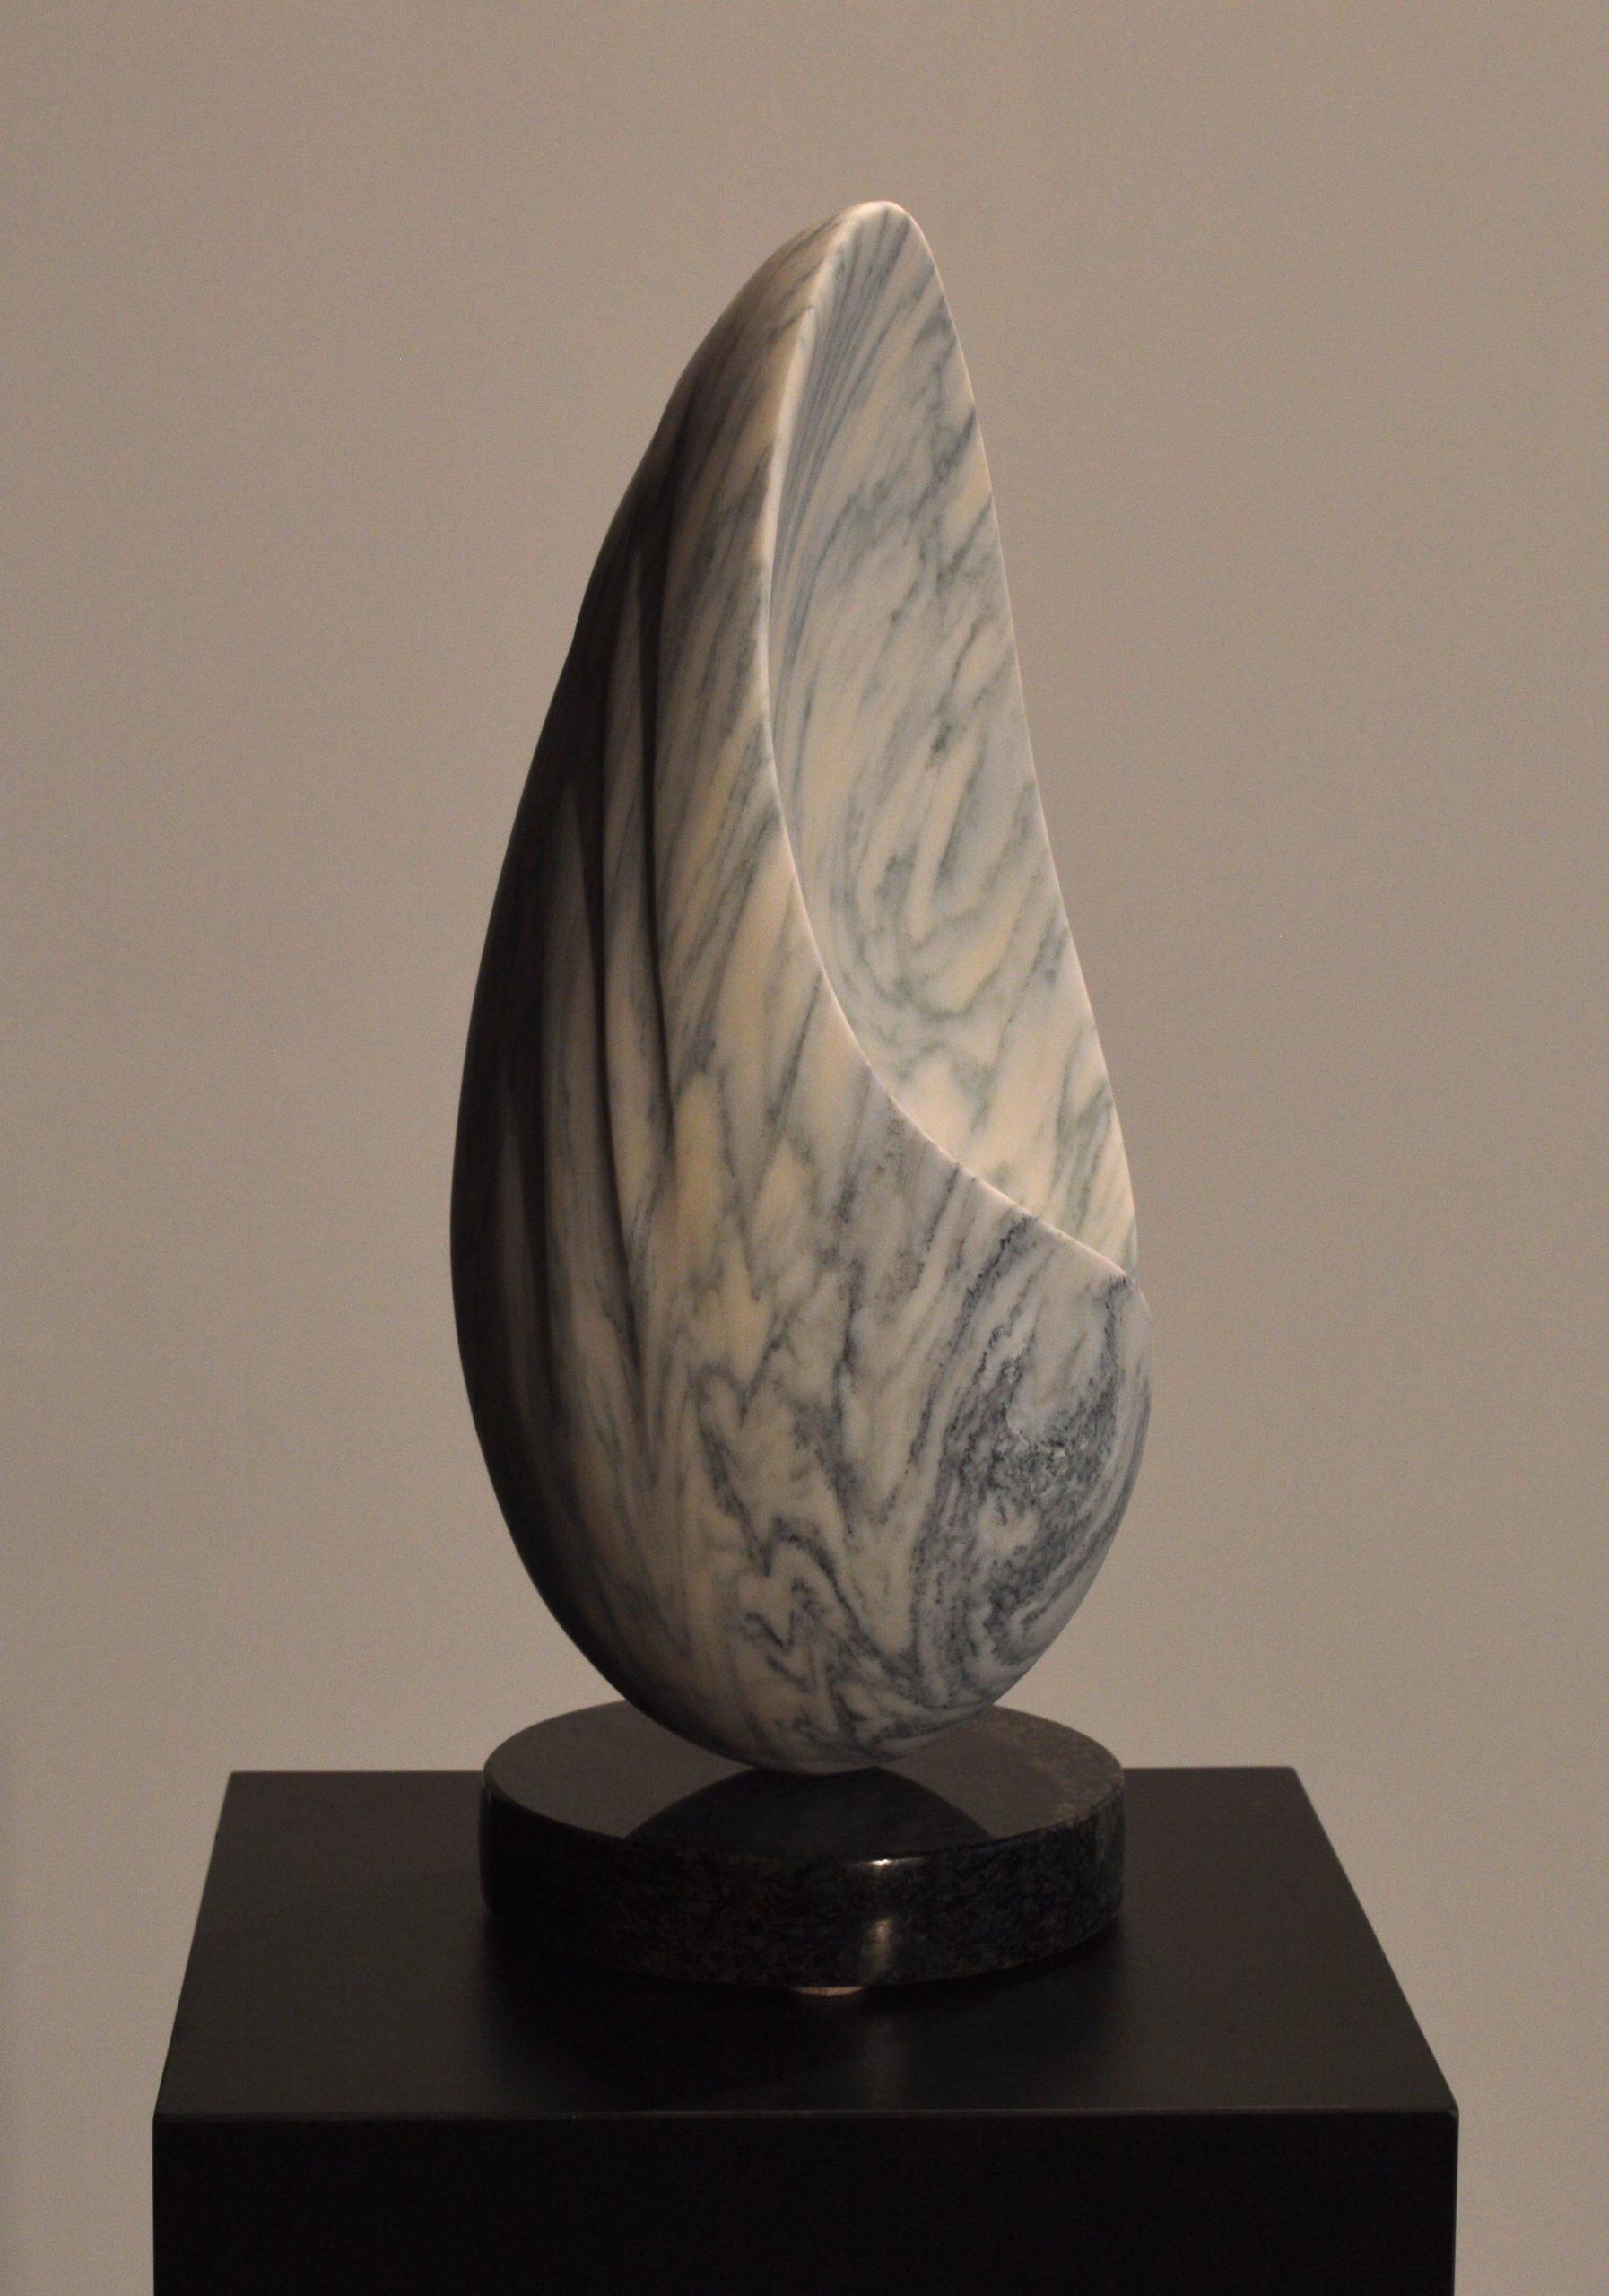 michael binkley sculptor stone sculpture abstract egg shell carrara marble vancouver canada